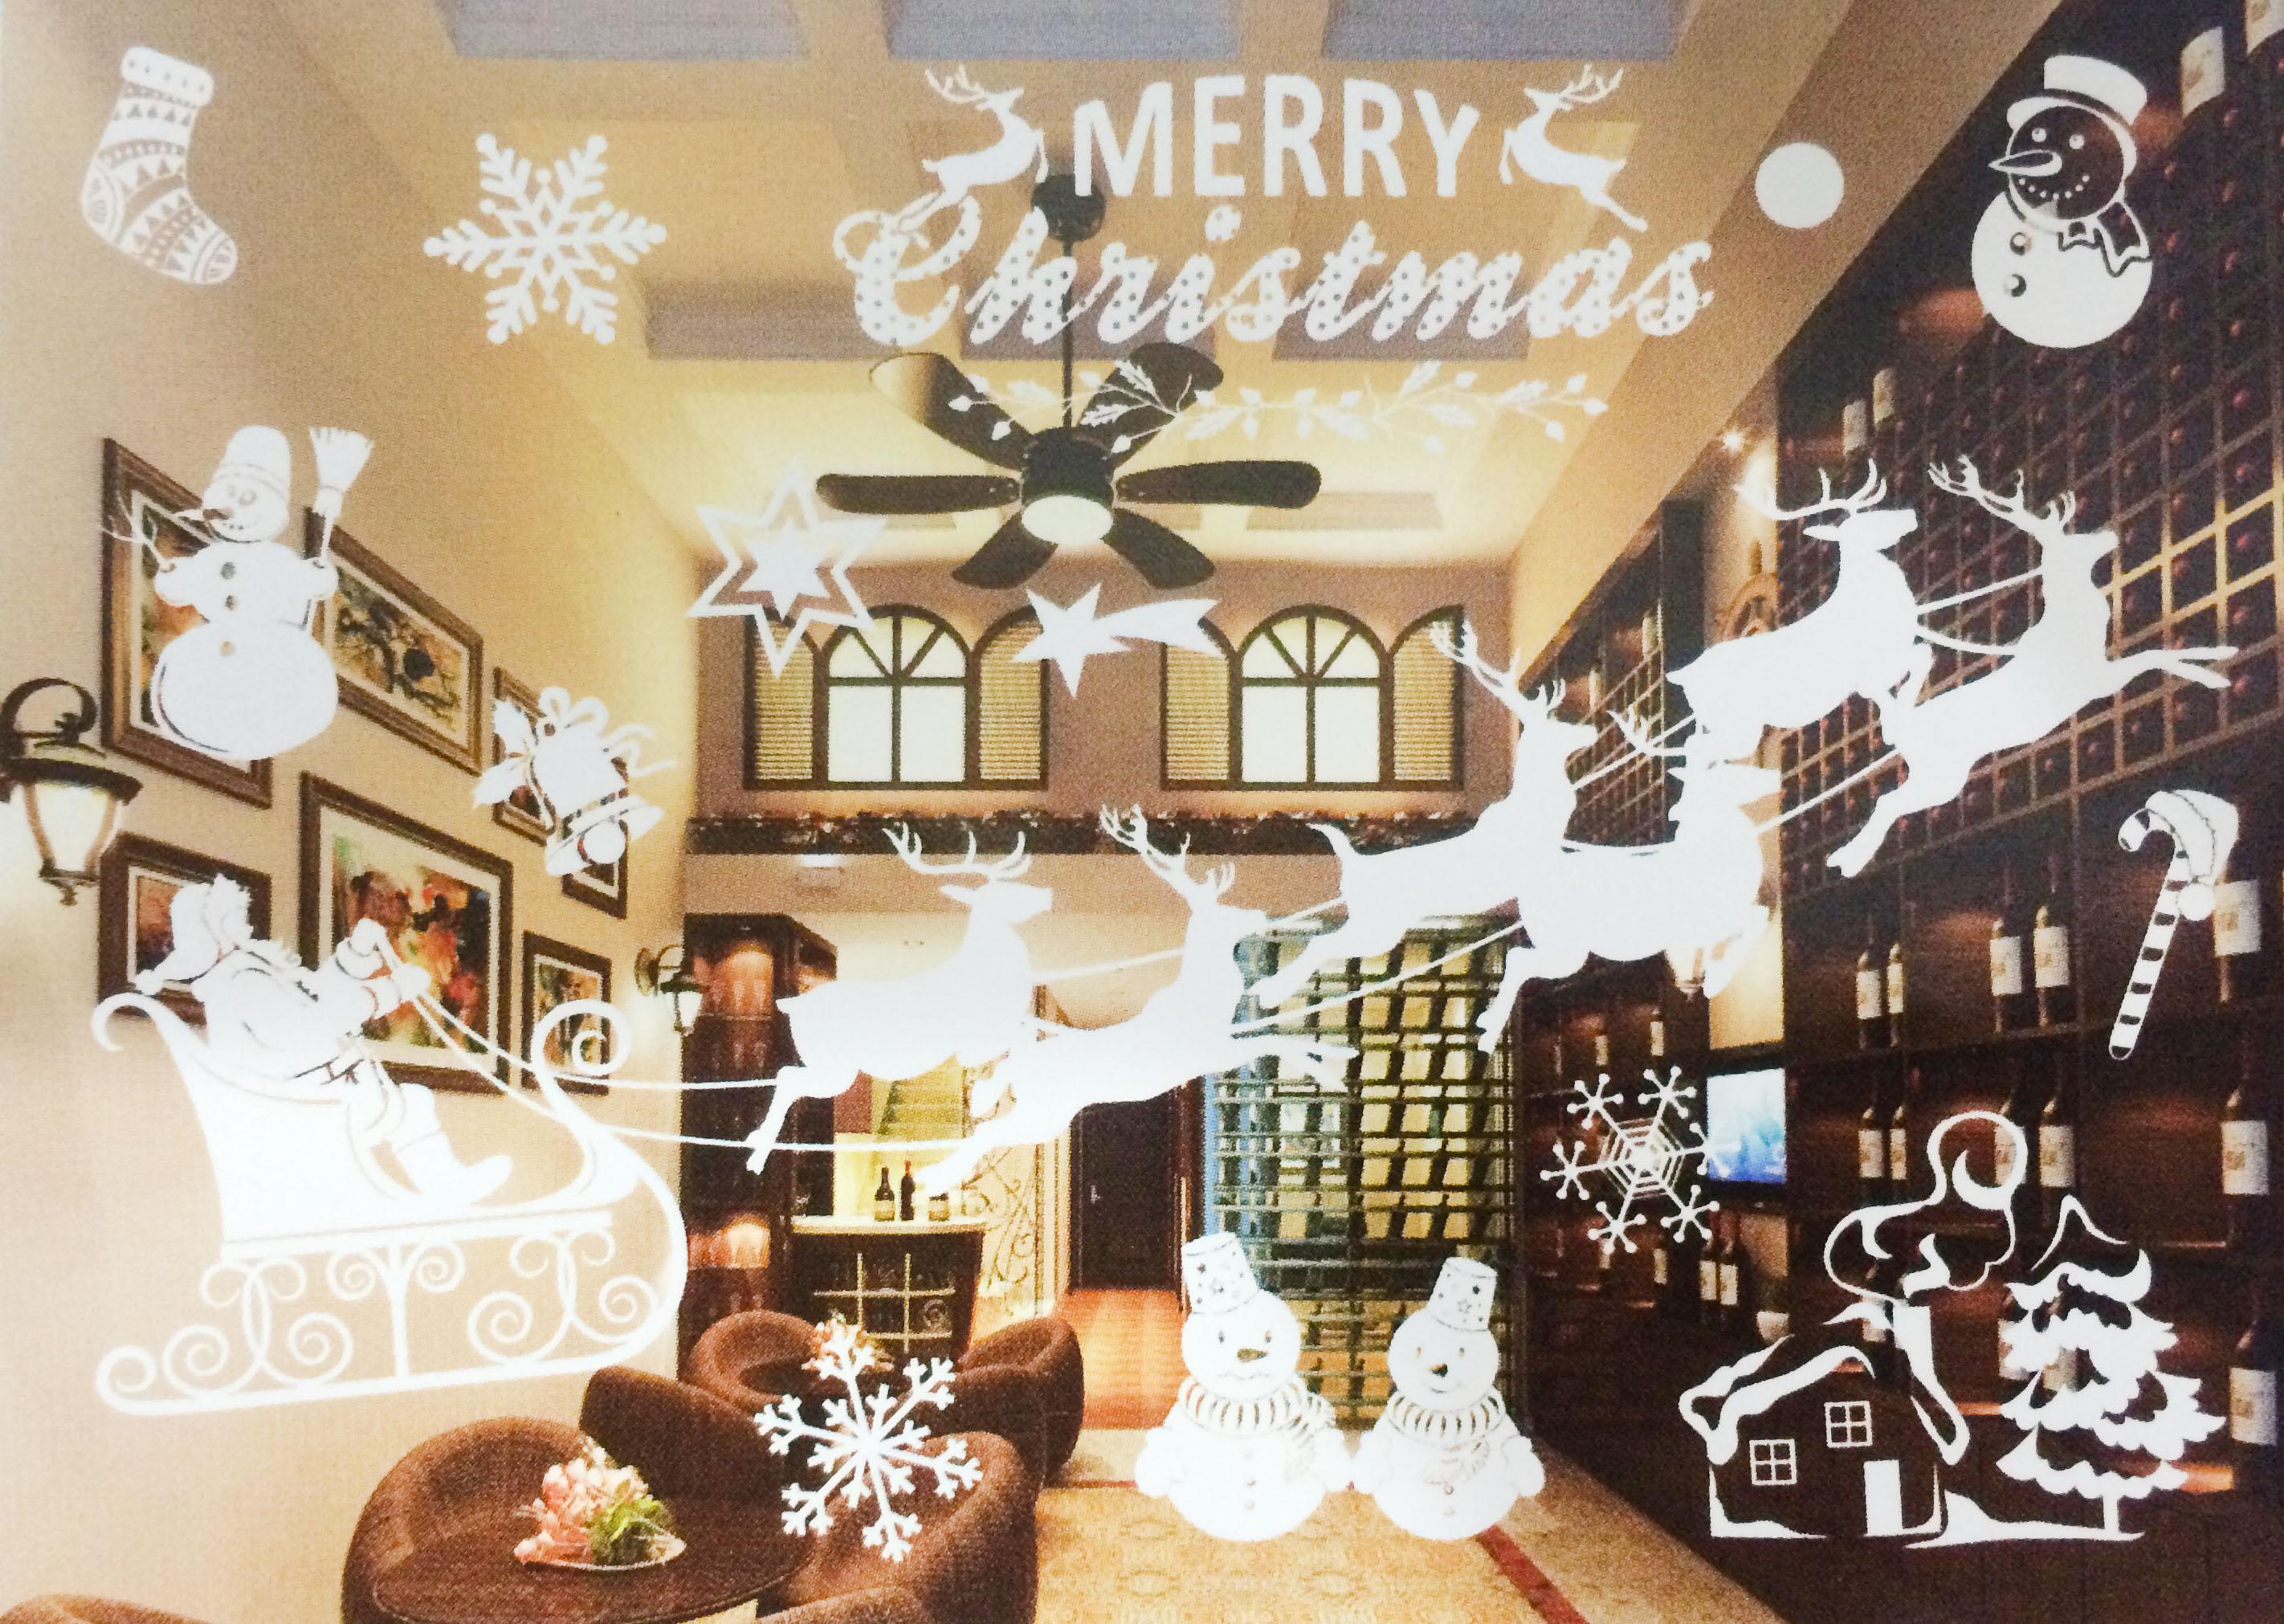 X射線【X150012】麋鹿老人(白色) 靜電窗貼,聖誕節/聖誕擺飾/聖誕佈置/聖誕造景/聖誕裝飾/玻璃貼/牆面佈置/壁貼